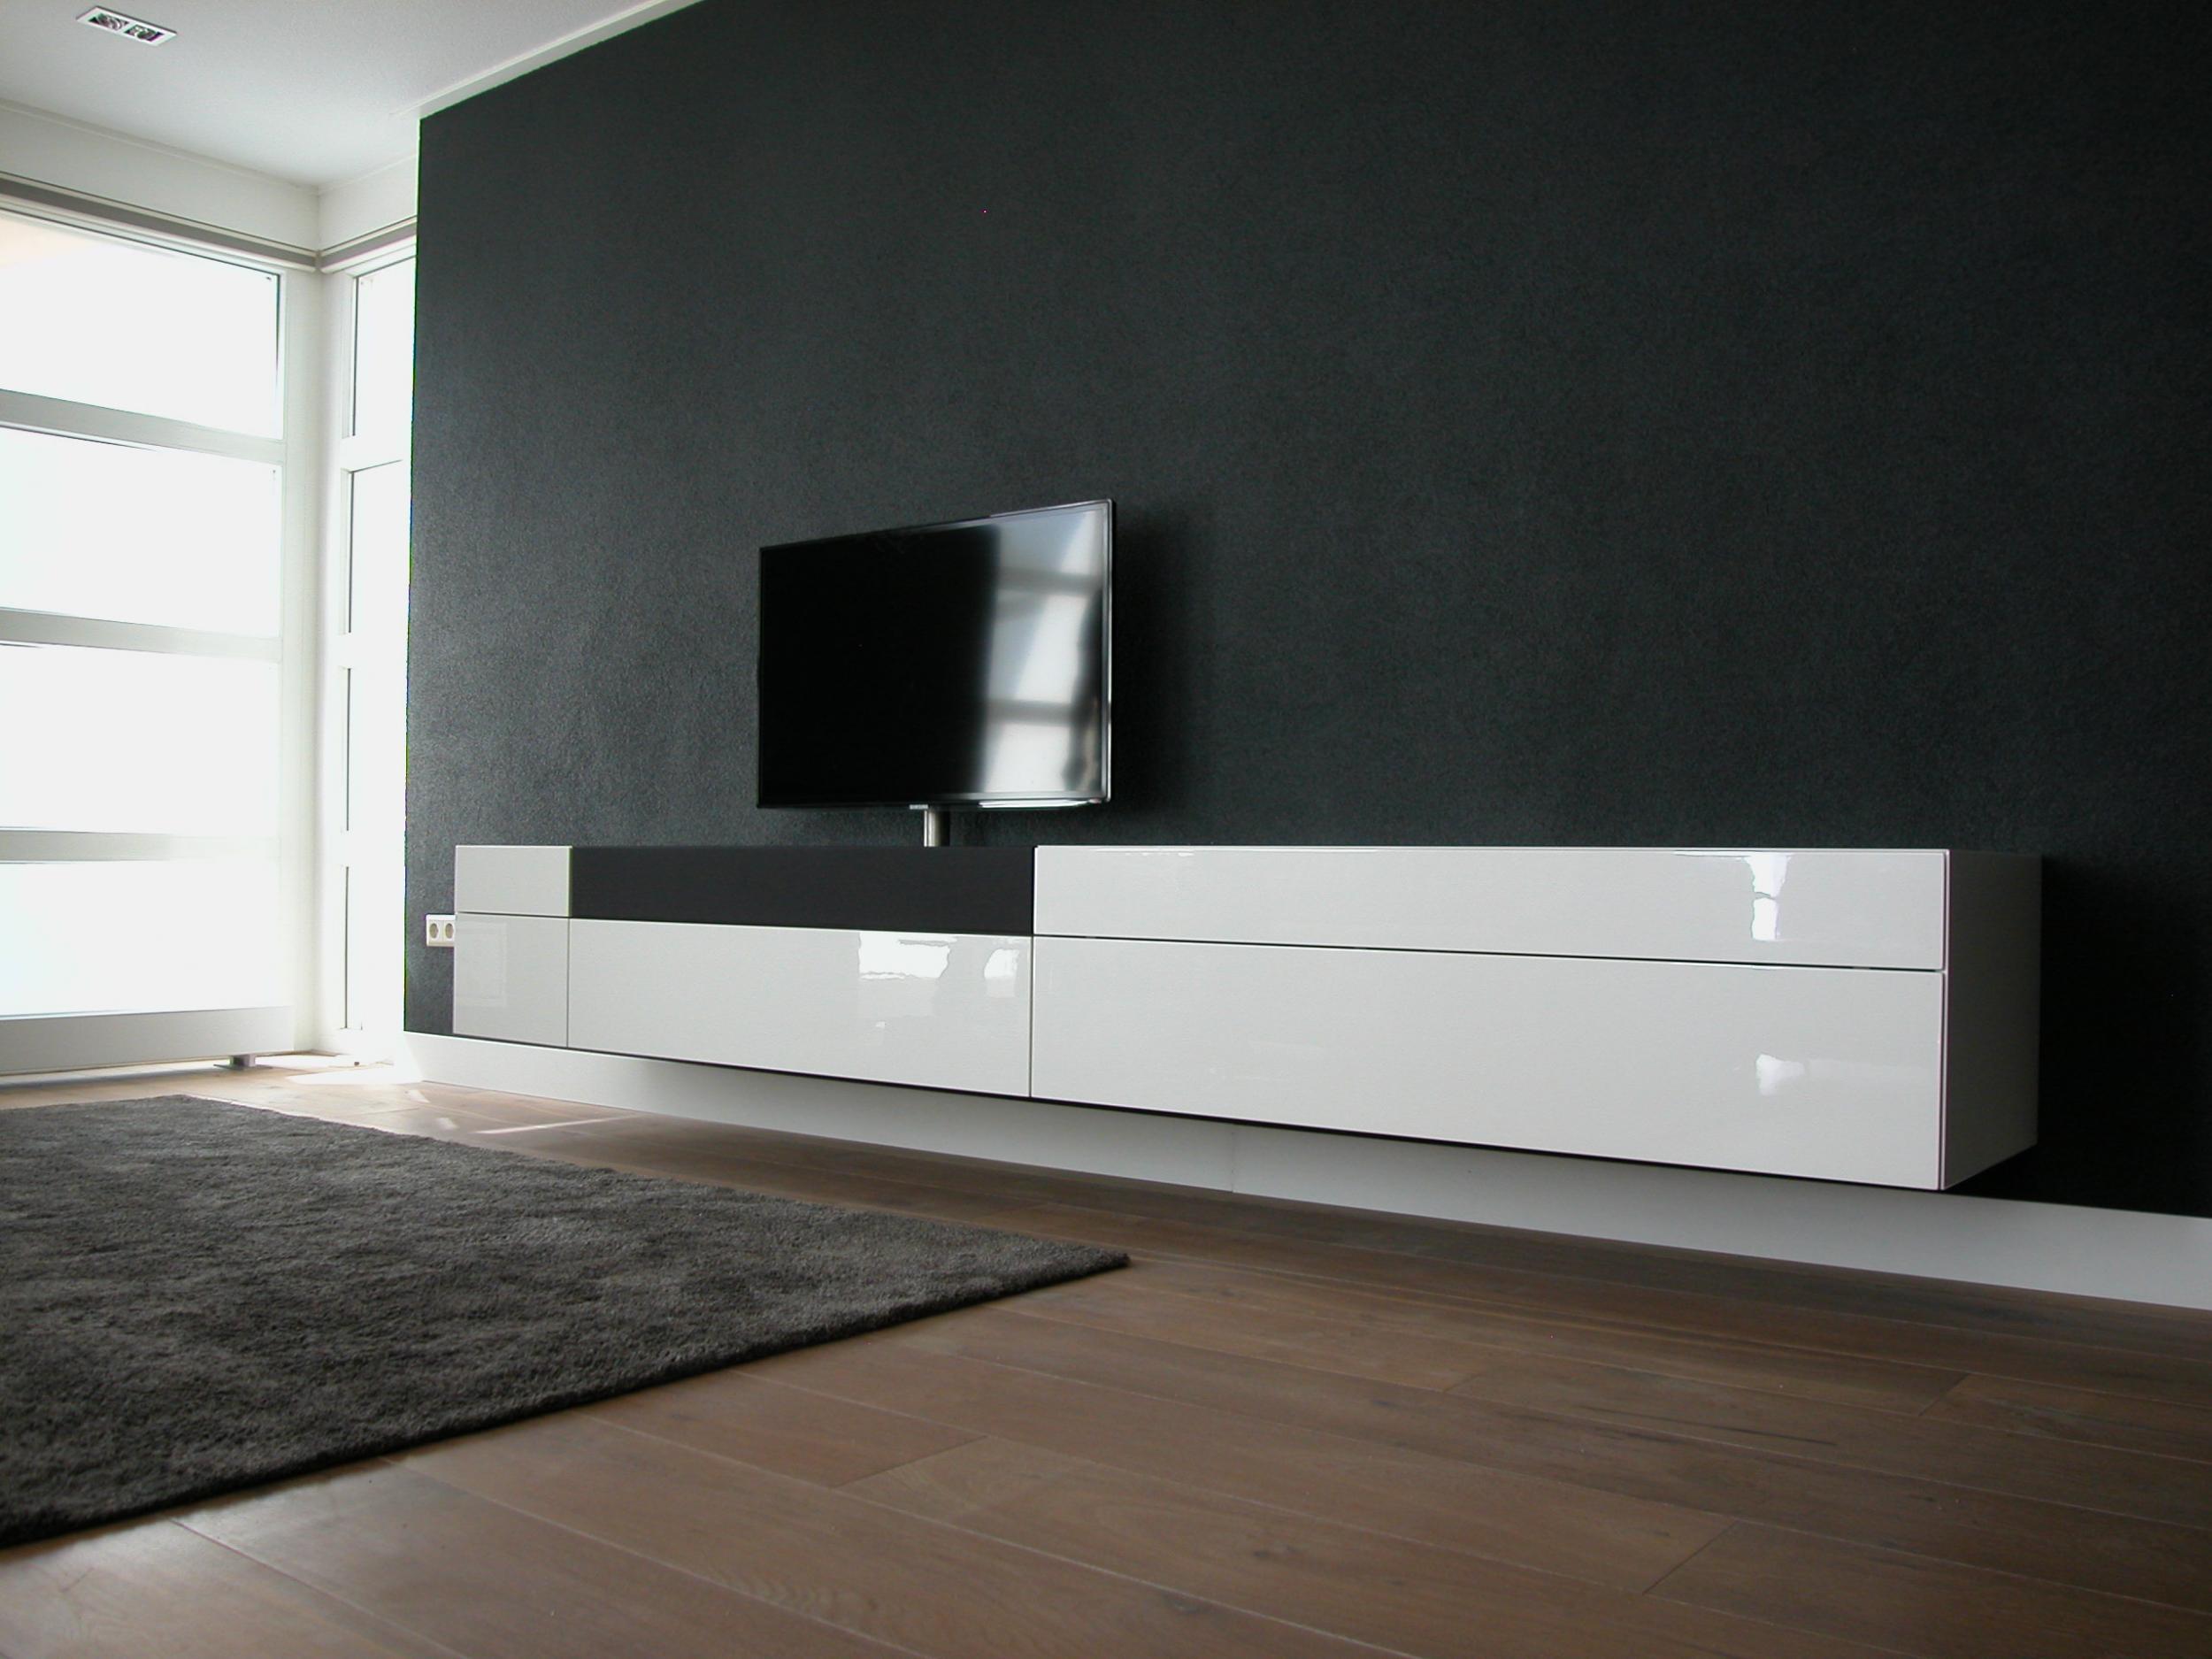 Tv Meubel 300 Cm.Artyx The New Design Vision Avs 300 Concept Tv Meubel In